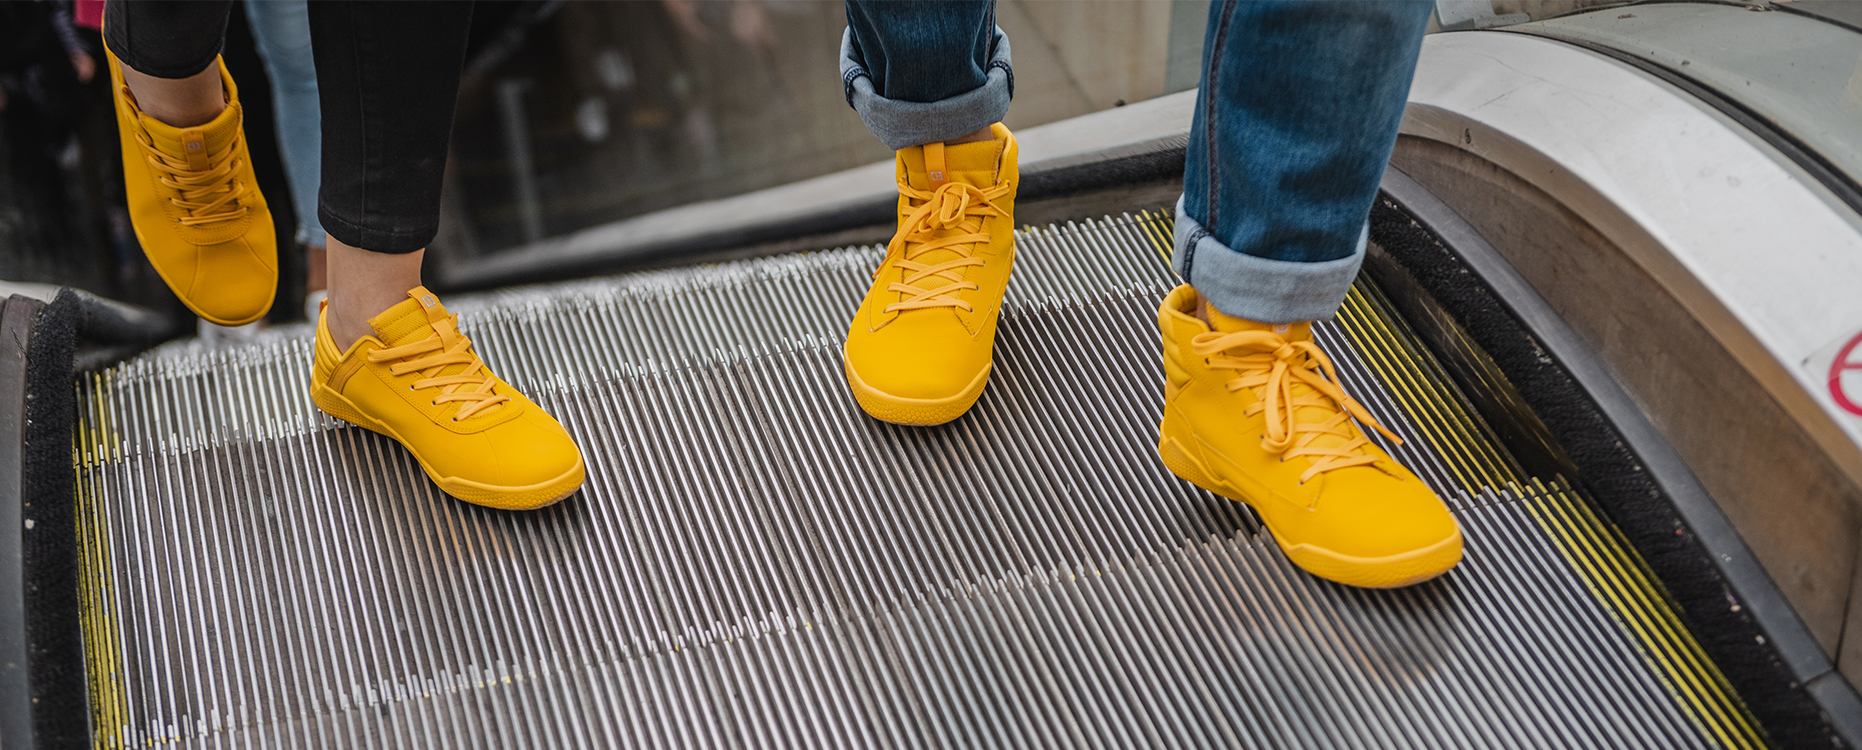 Cat Code Shoes on an escalator